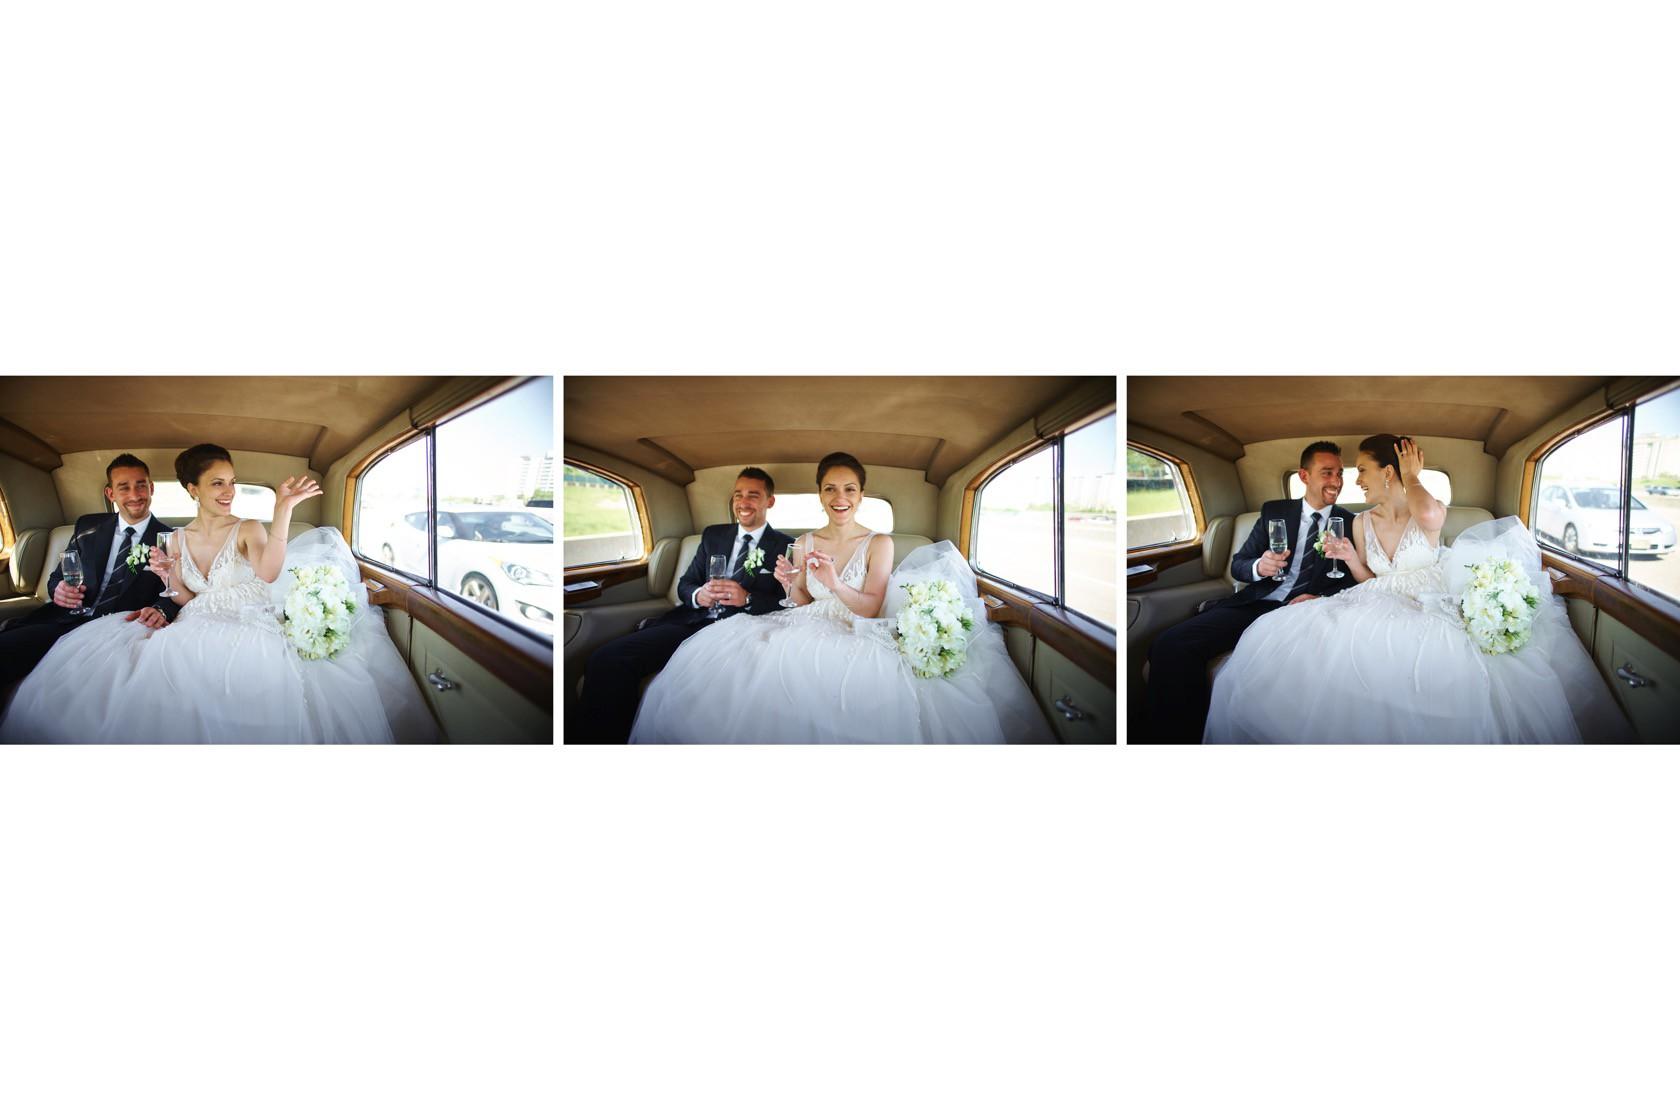 stephen sager photography 0036 fine art wedding photography